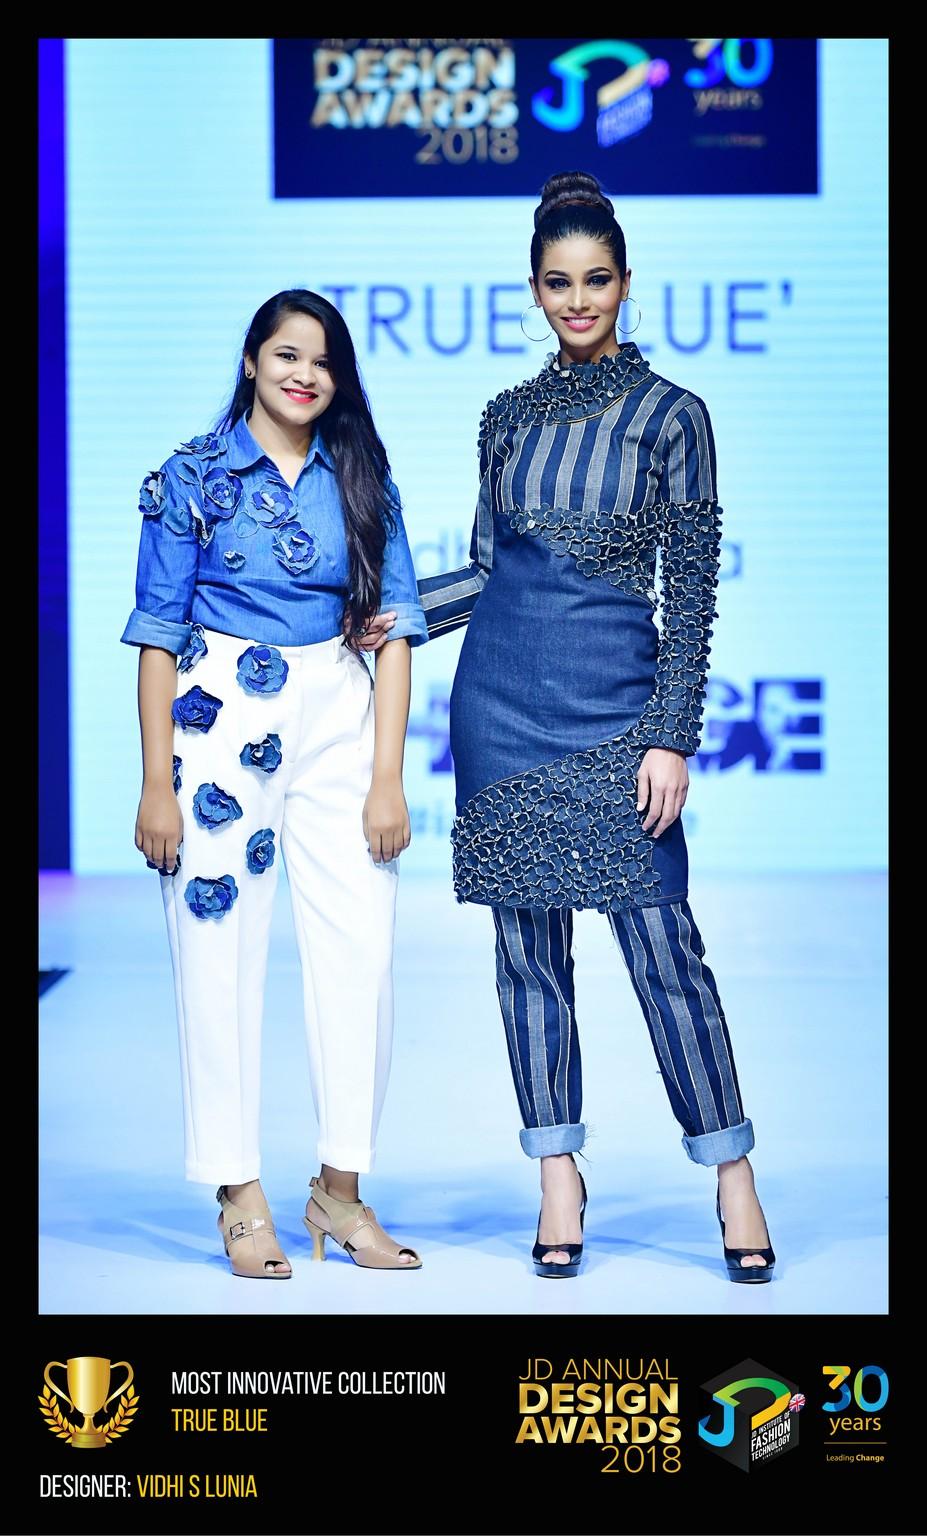 True Blue – Change – JD Annual Design Awards 2018 | Designer: Vidhi Lunia (ADFD 2015) | Photography : Jerin Nath (@jerin_nath) true blue - True Blue Photos JDW FB11 - True Blue – Change – JD Annual Design Awards 2018